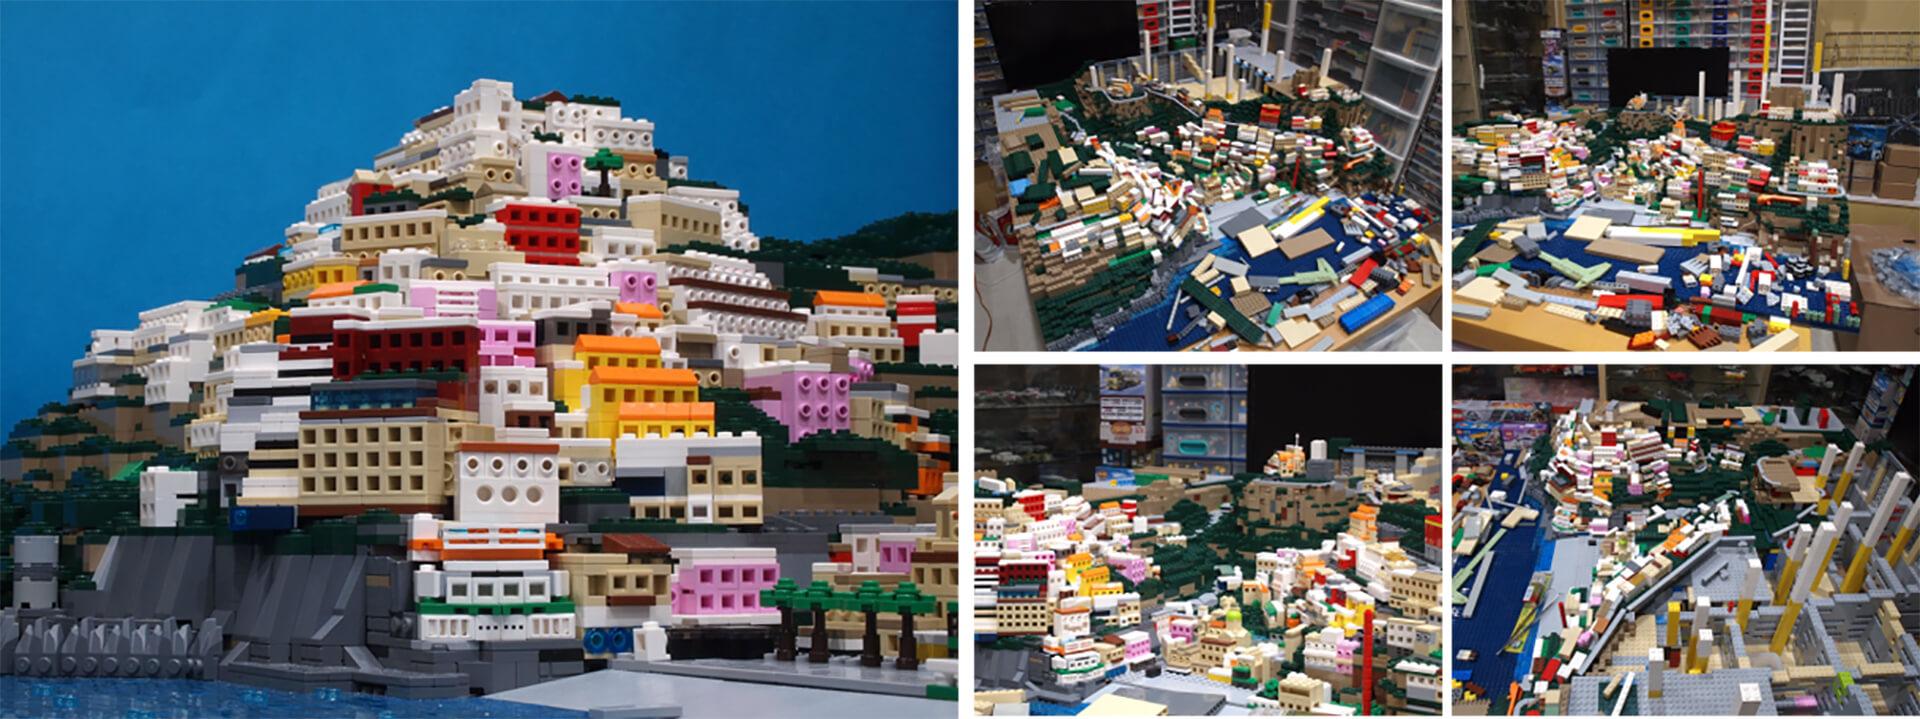 PIECE OF PEACE 『レゴ(R)ブロック』で作った世界遺産展 PART-4・製作過程